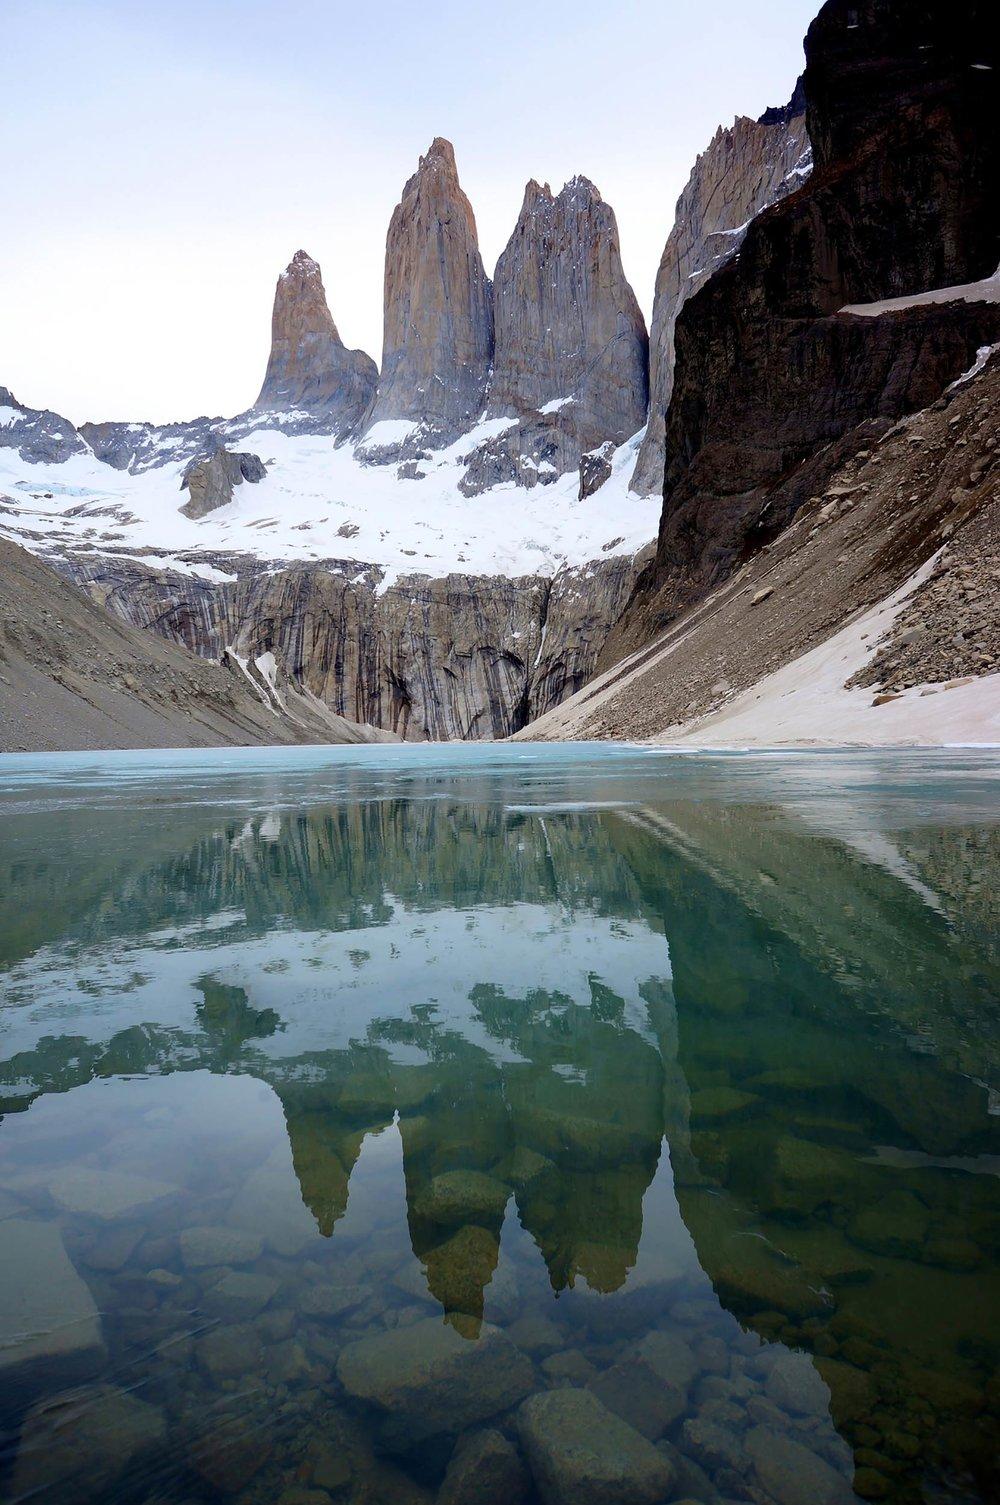 las_torres_torres_del_paine_w_trek.jpg